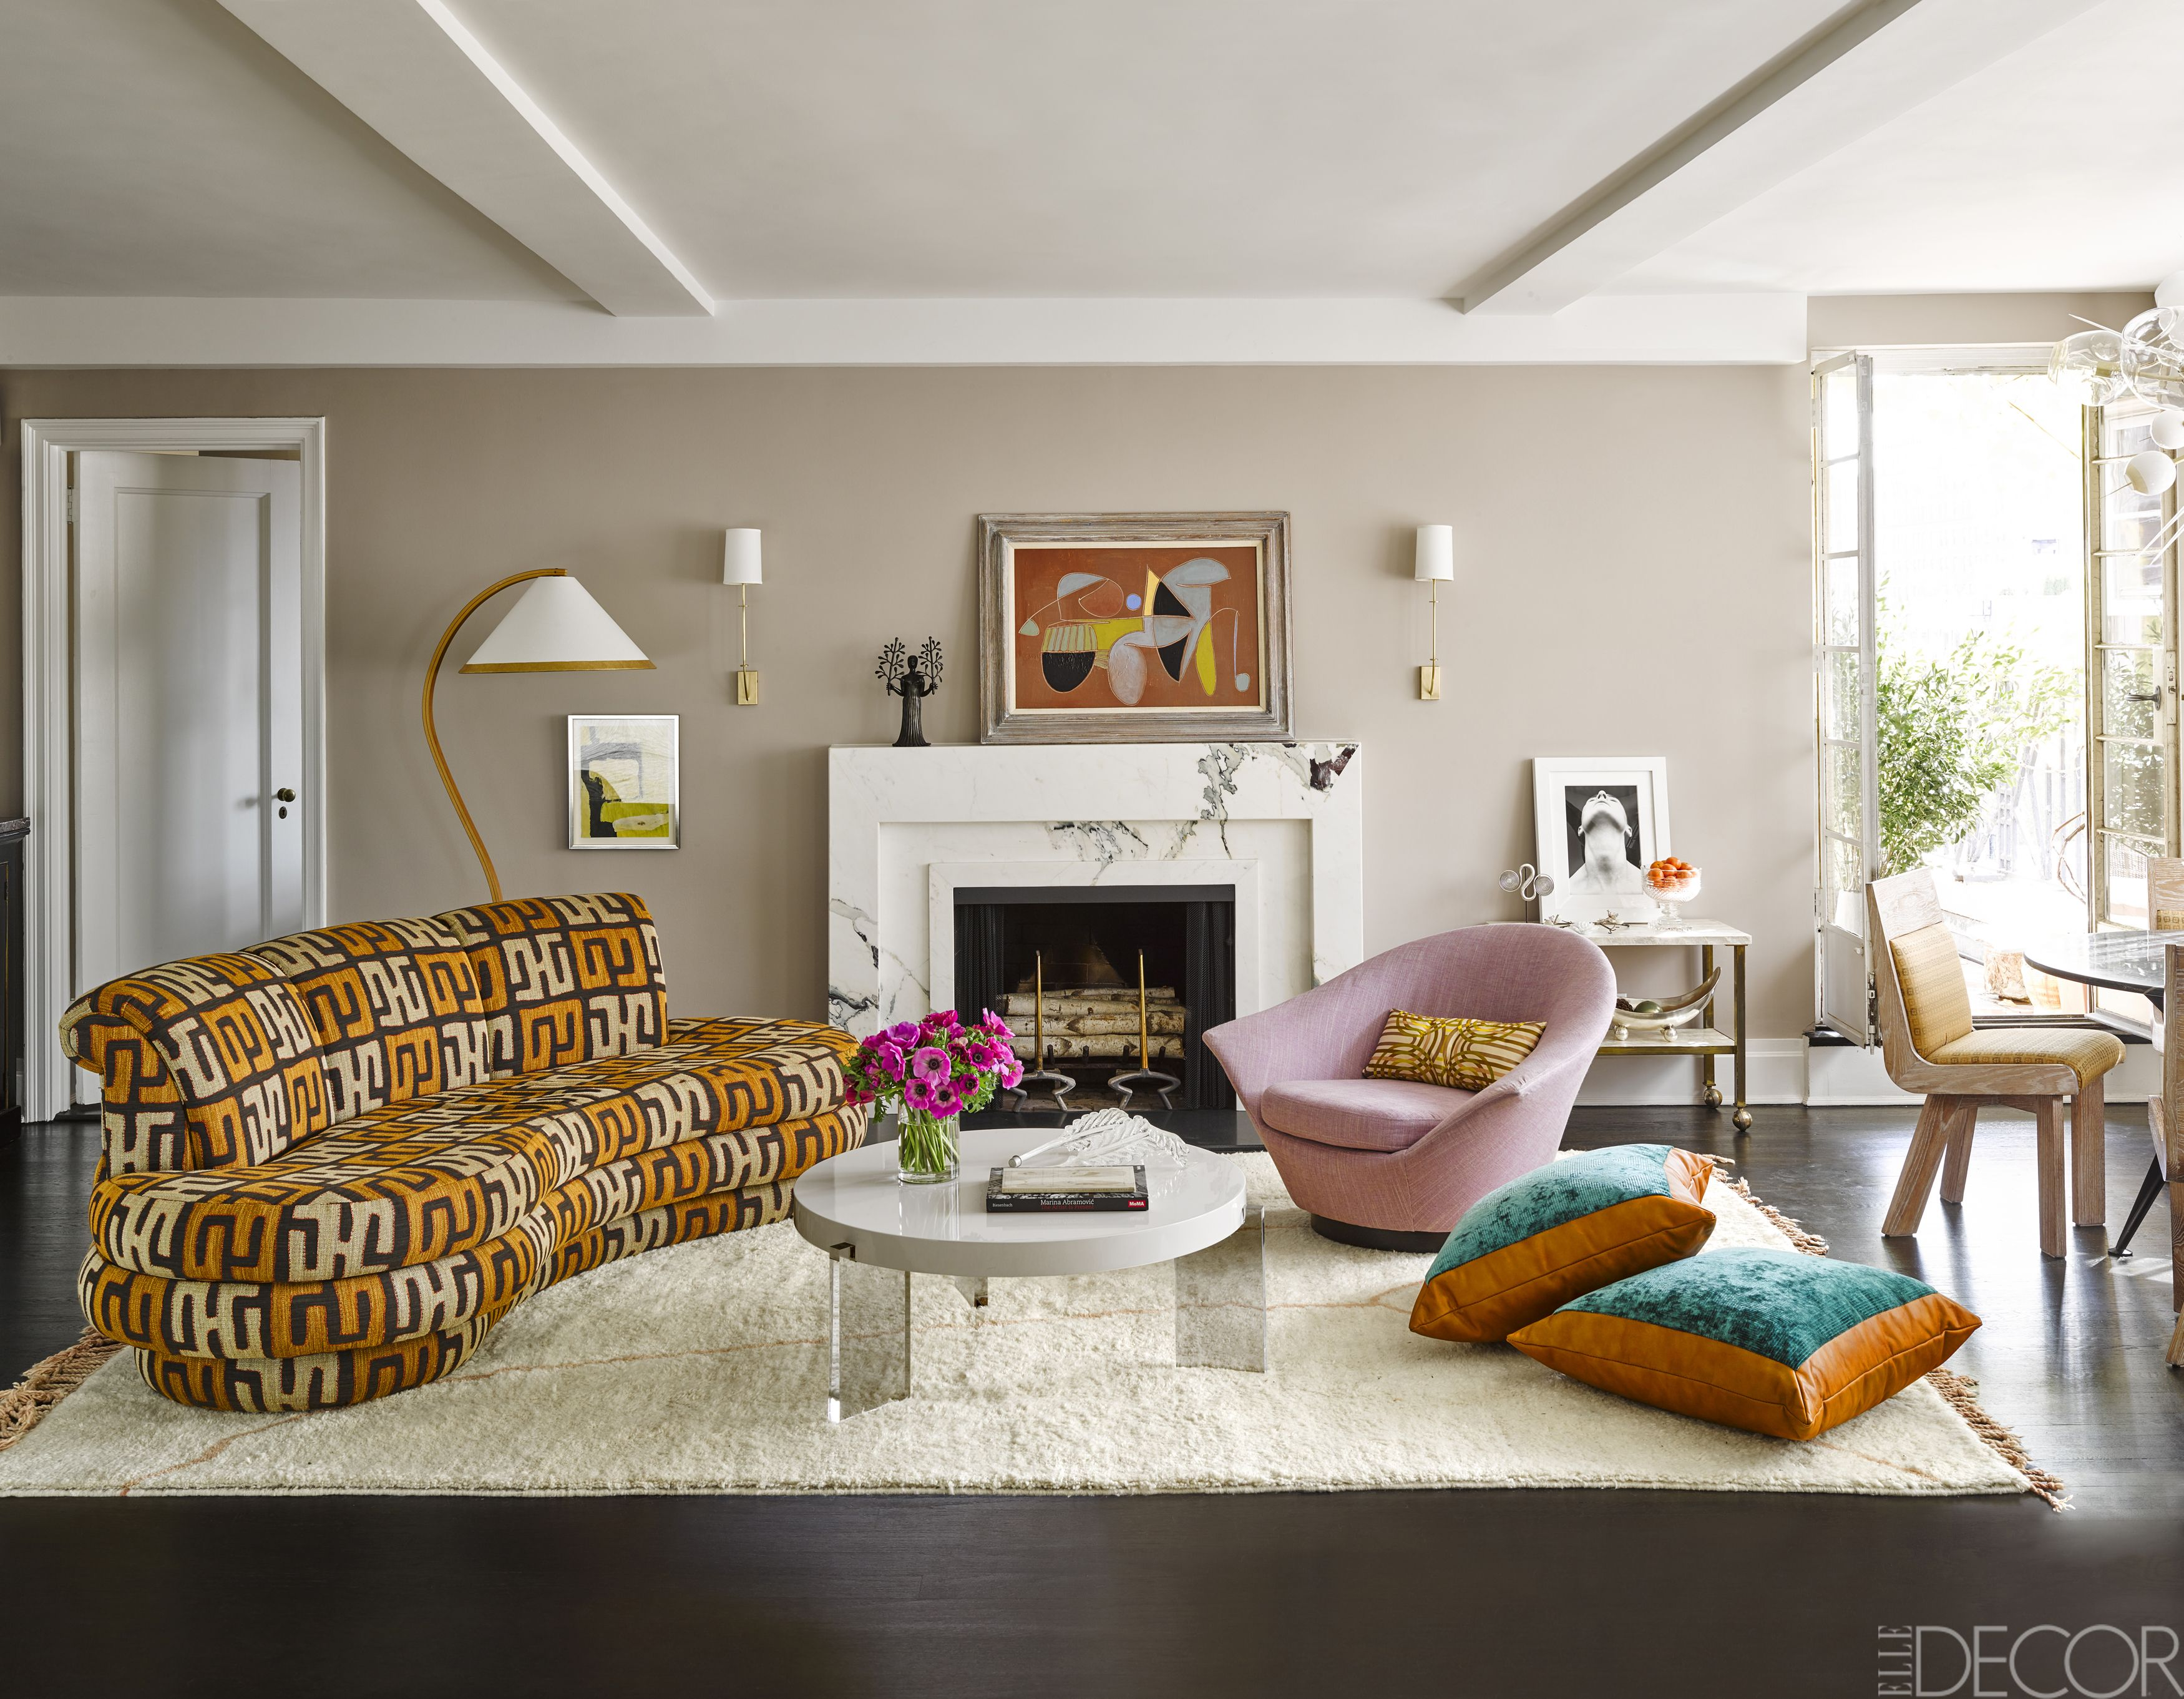 decorated living rooms images room center furniture 56 lovely design ideas best modern decor